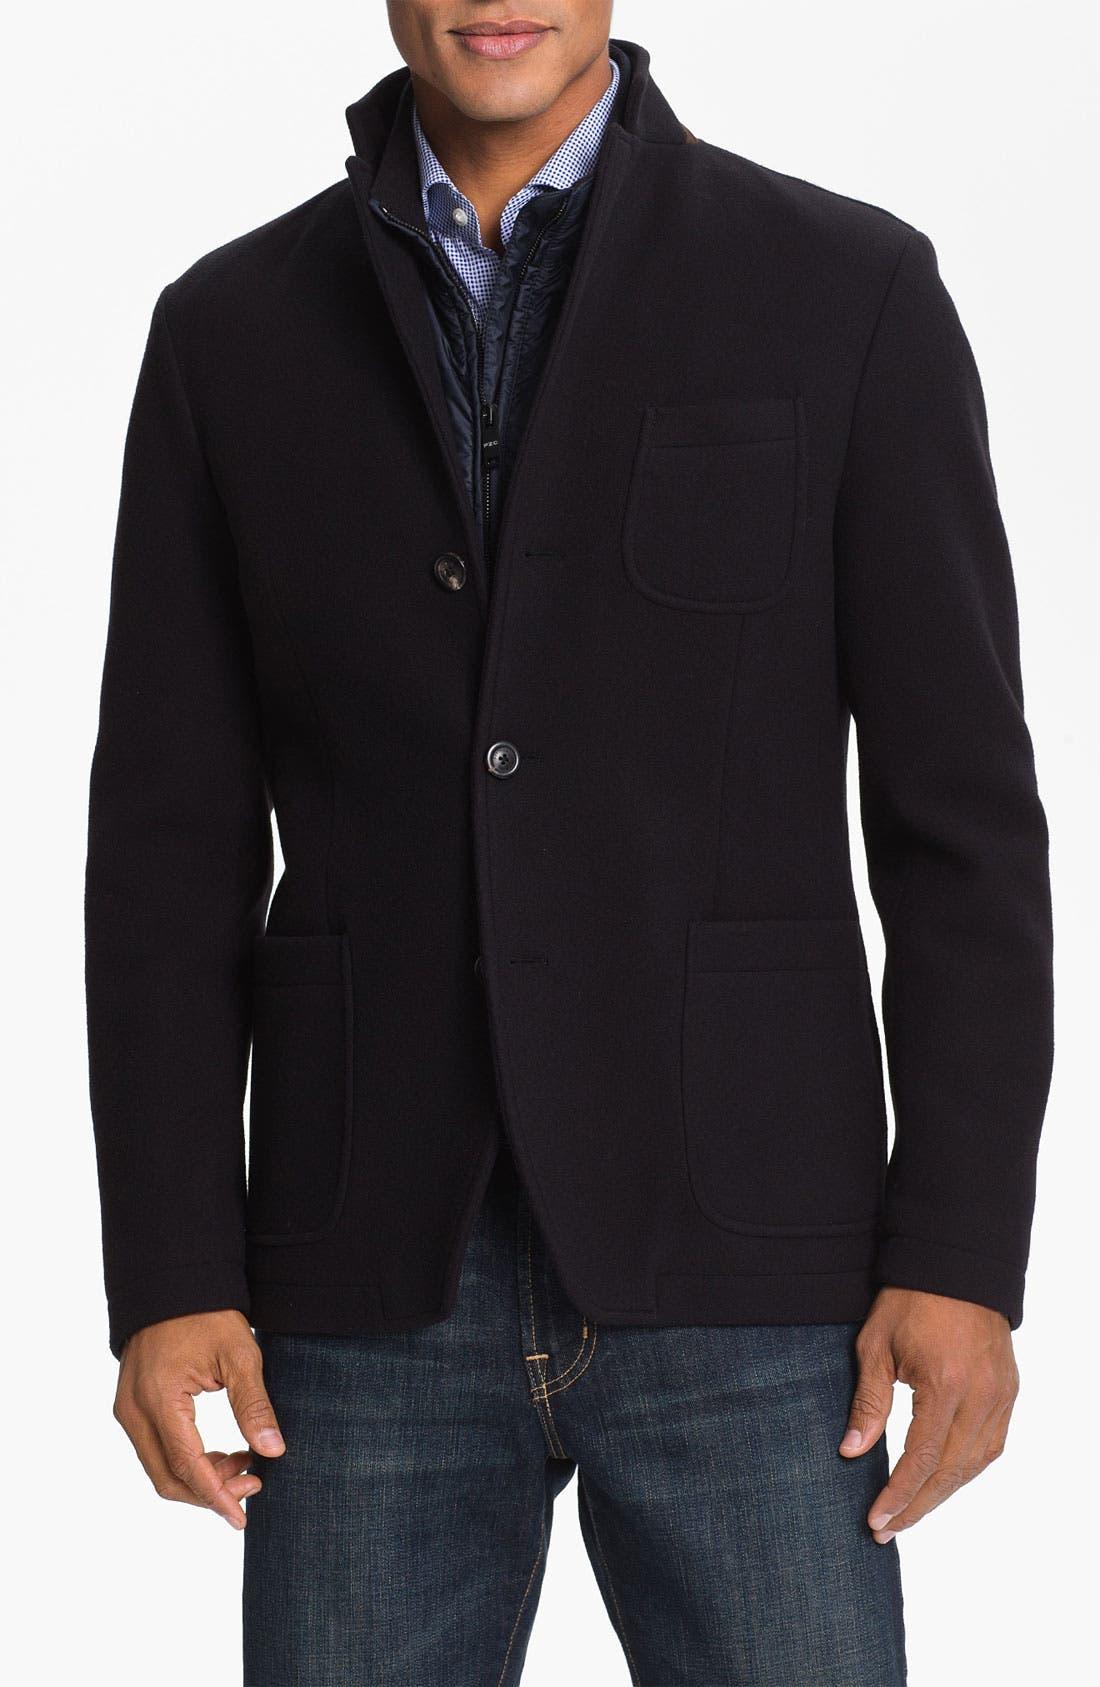 Main Image - Pal Zileri Wool Blend Jacket